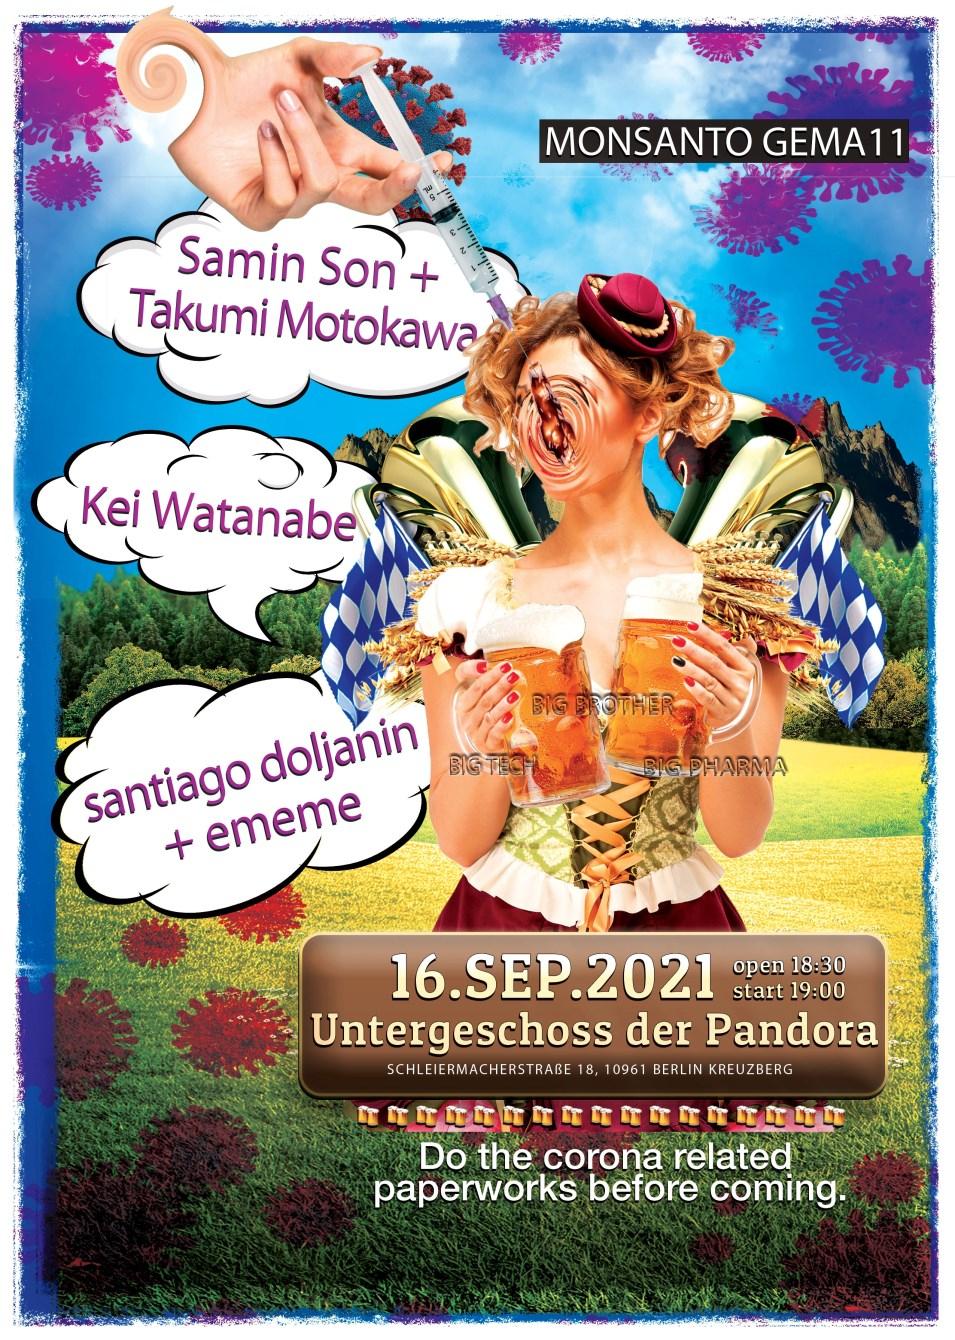 Monsanto Gema #11 - Flyer front